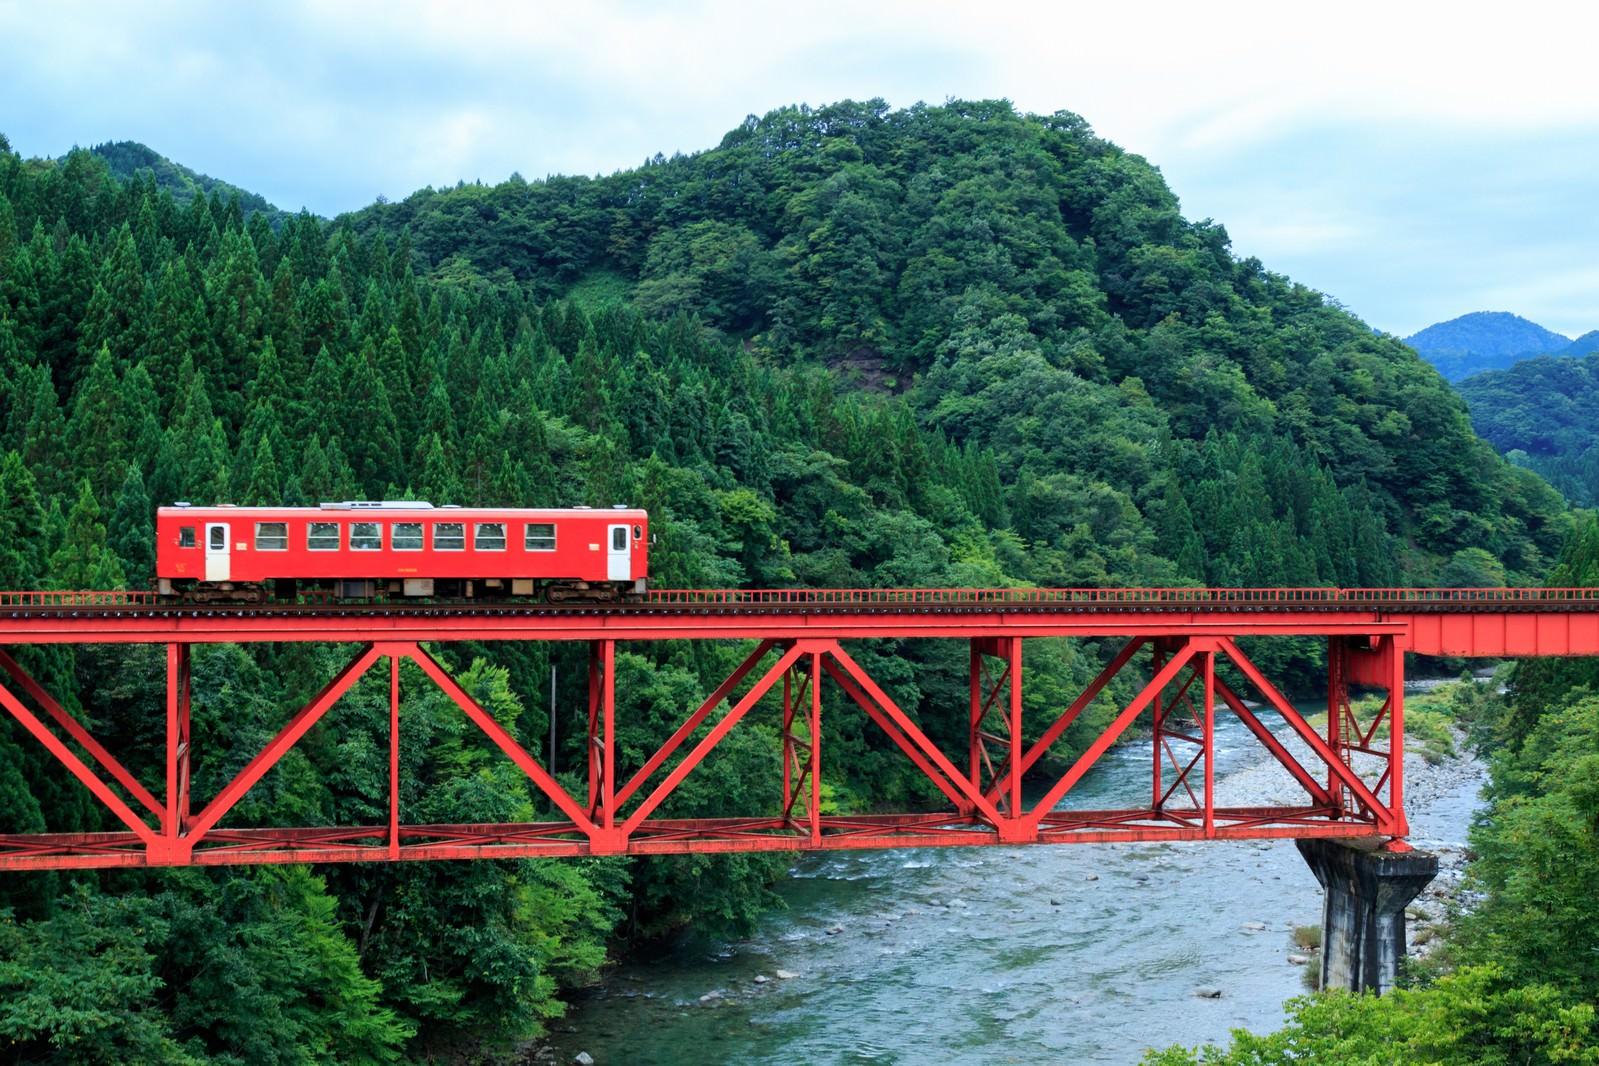 「秋田内陸鉄道」の写真